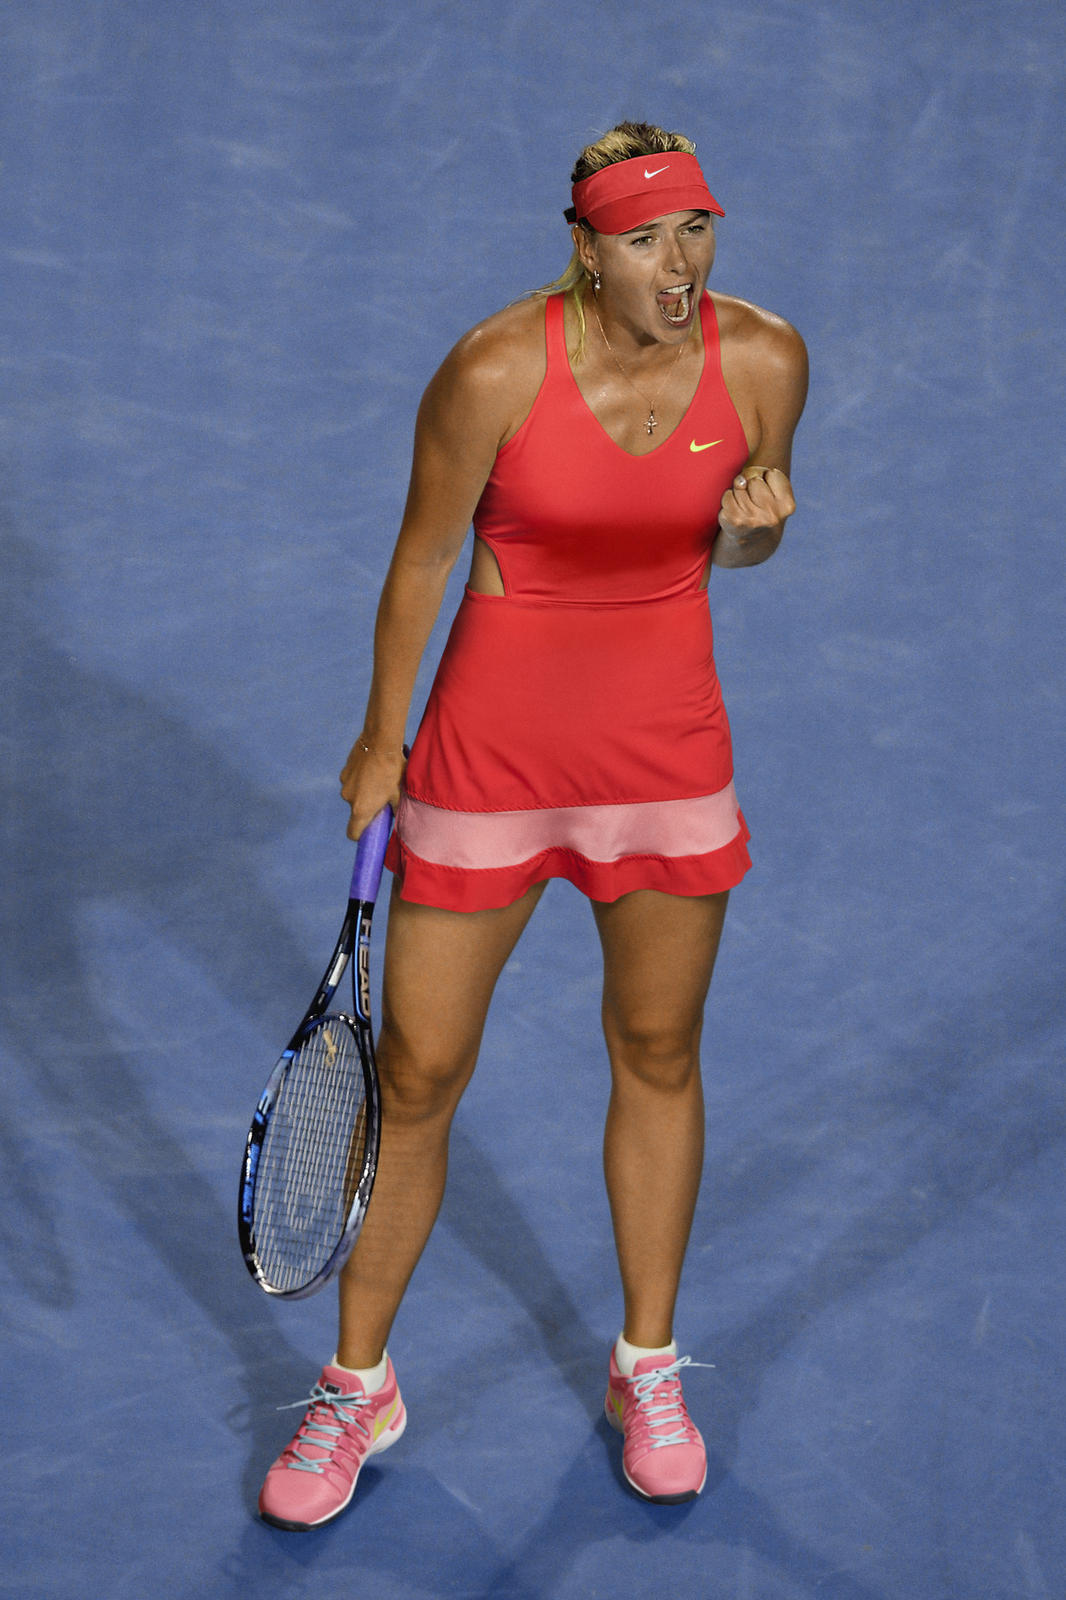 5061e8e9a1 Open d'Australie 2015 - Tenue Maria Sharapova (Nike tennis outfit) ...